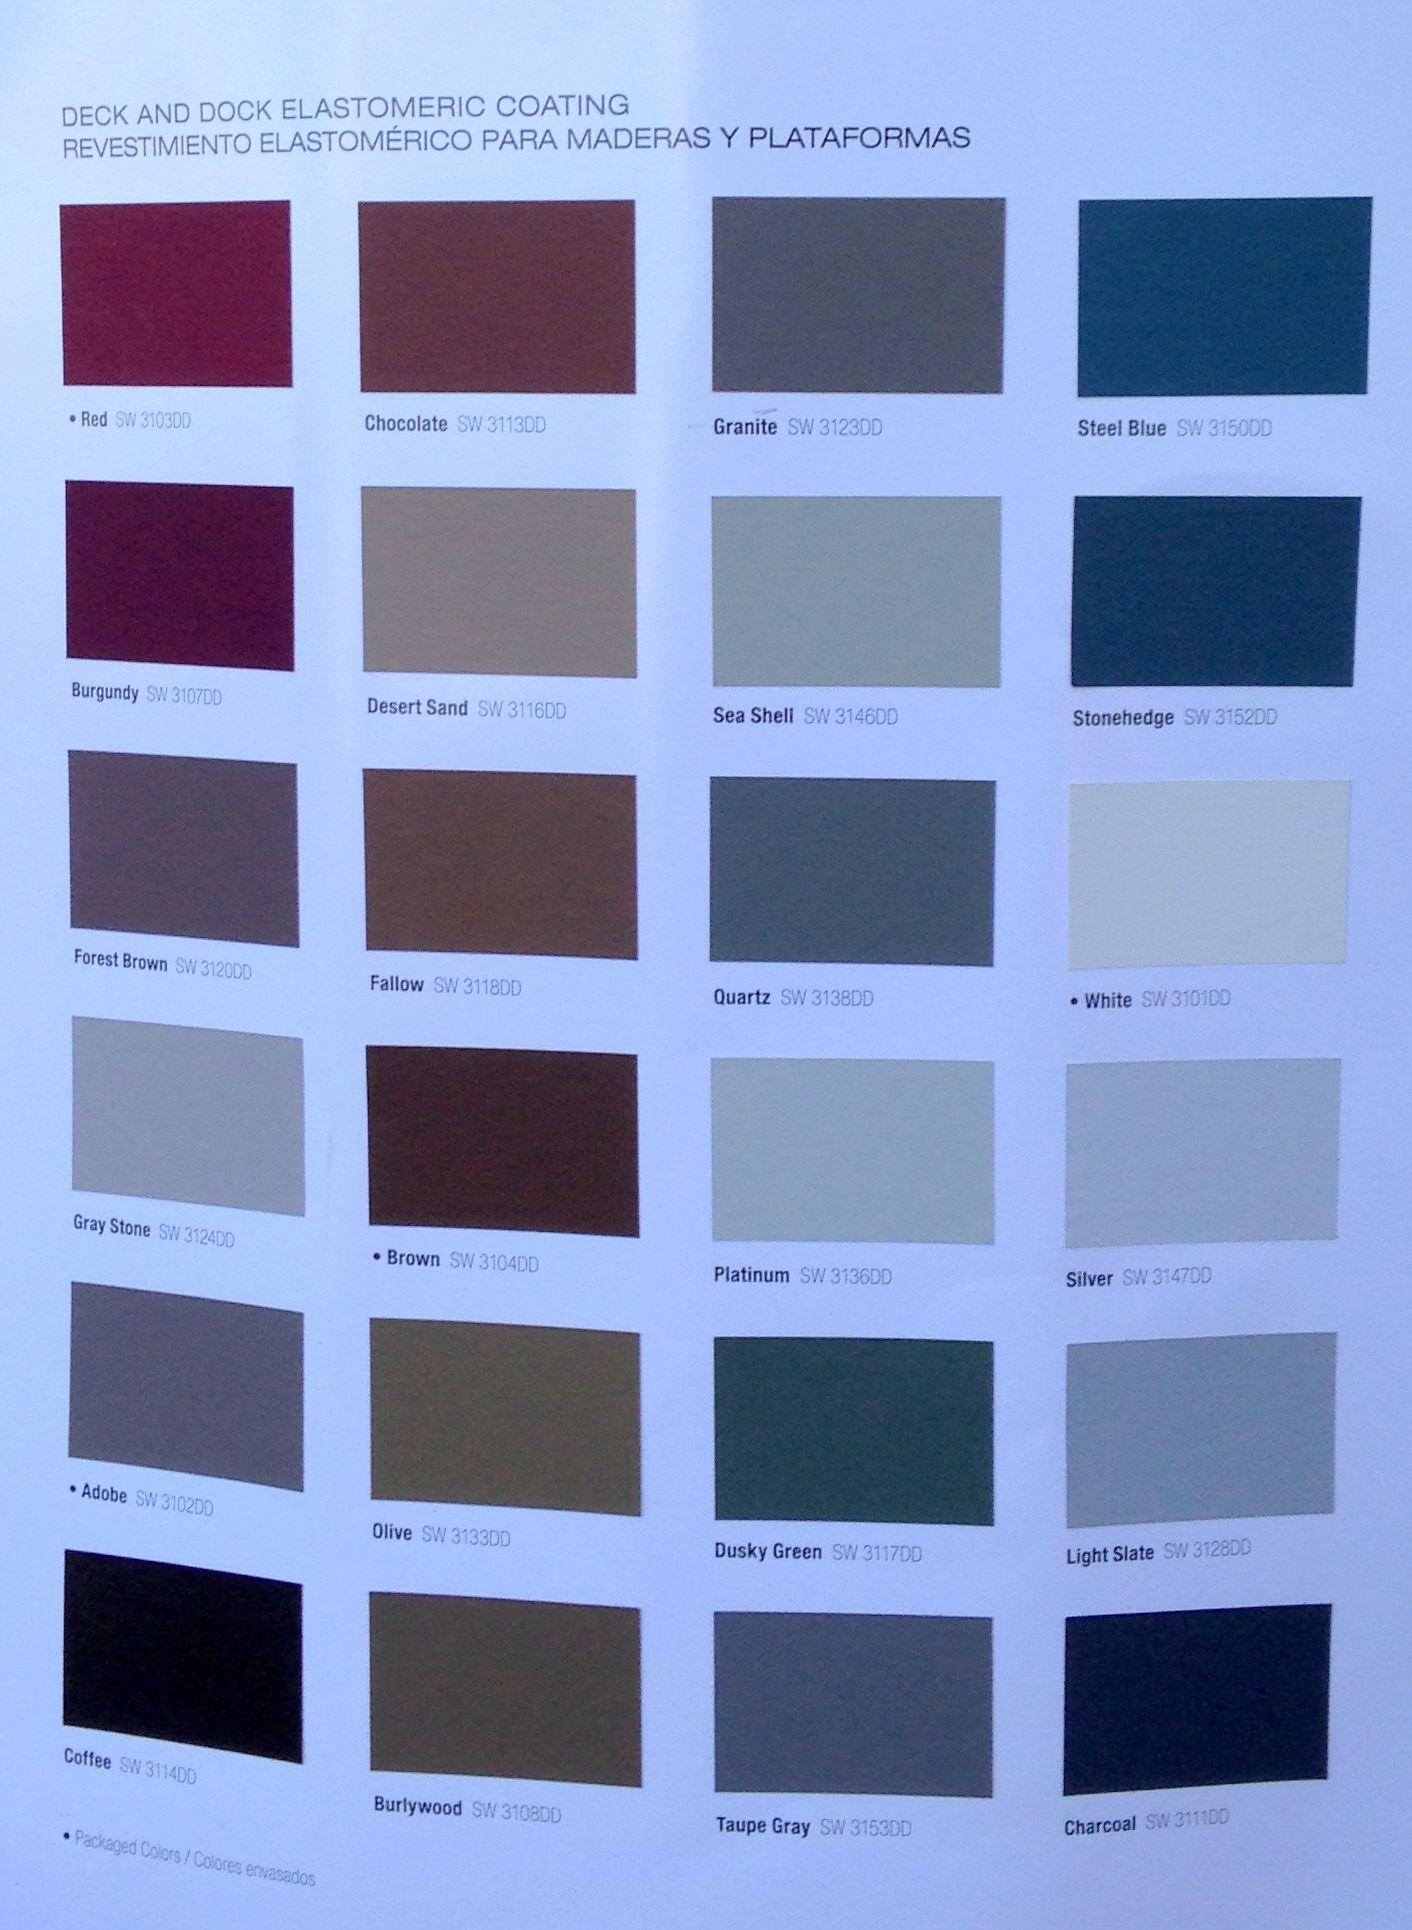 Sherwin Williams Elastomeric Coating Deck Dock Deck Colors Lake Houses Exterior Exterior Paint